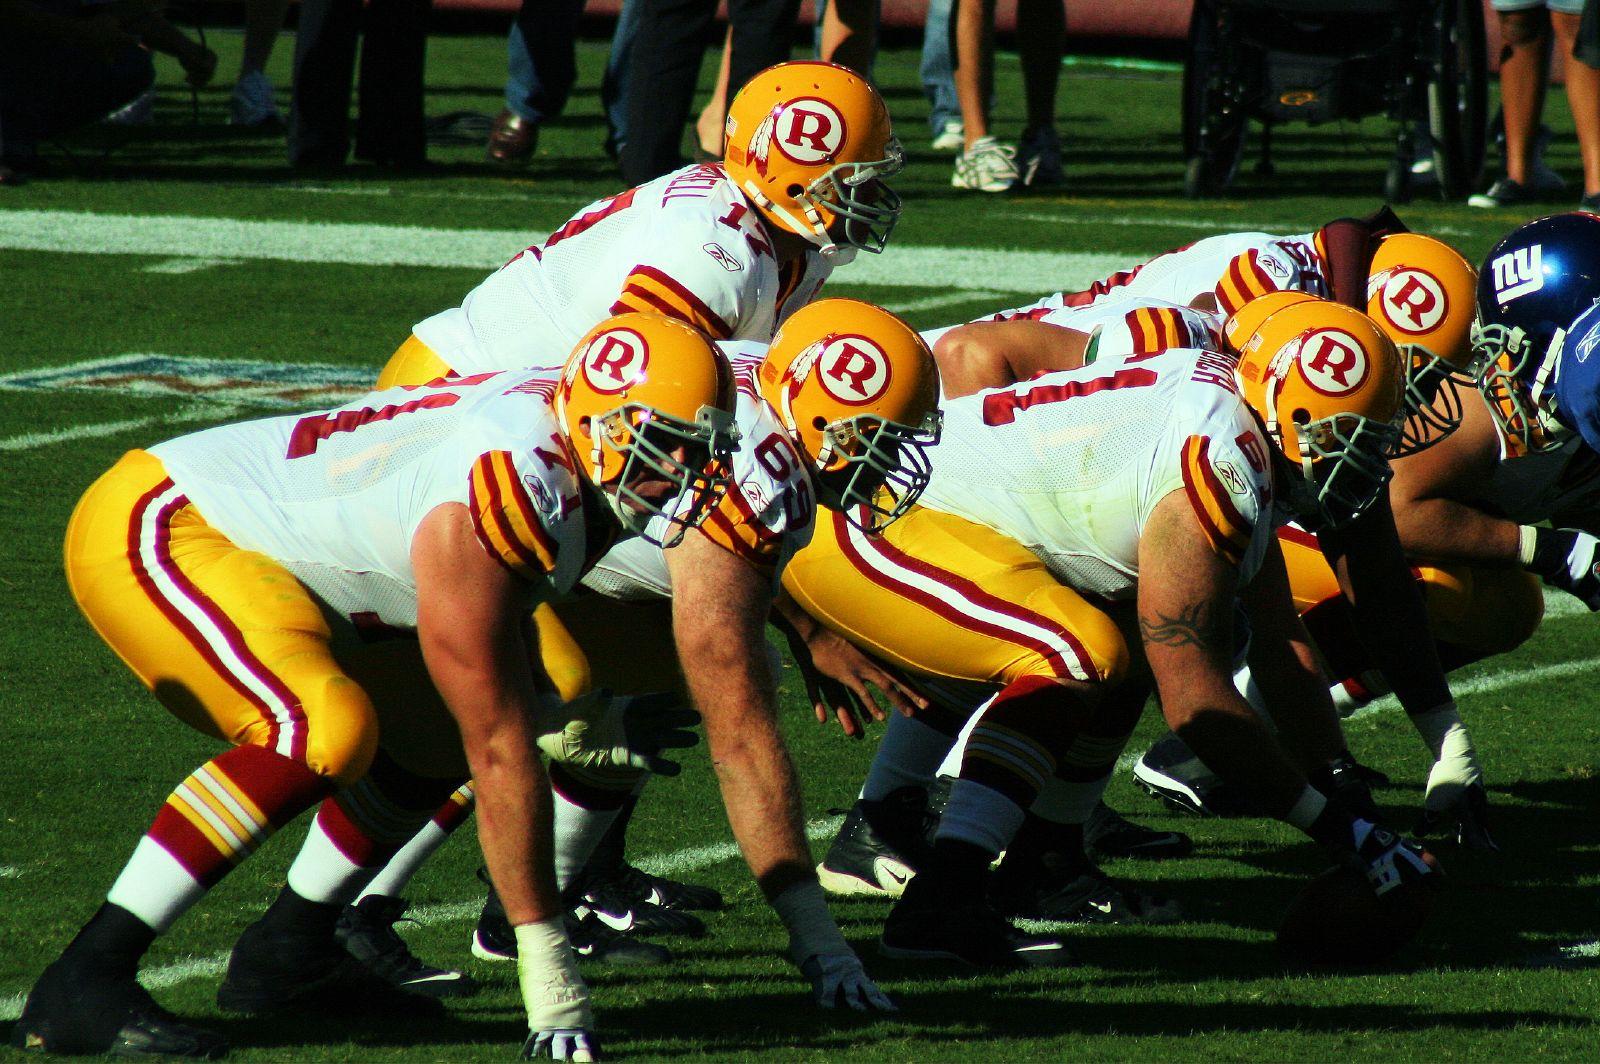 old redskins jerseys